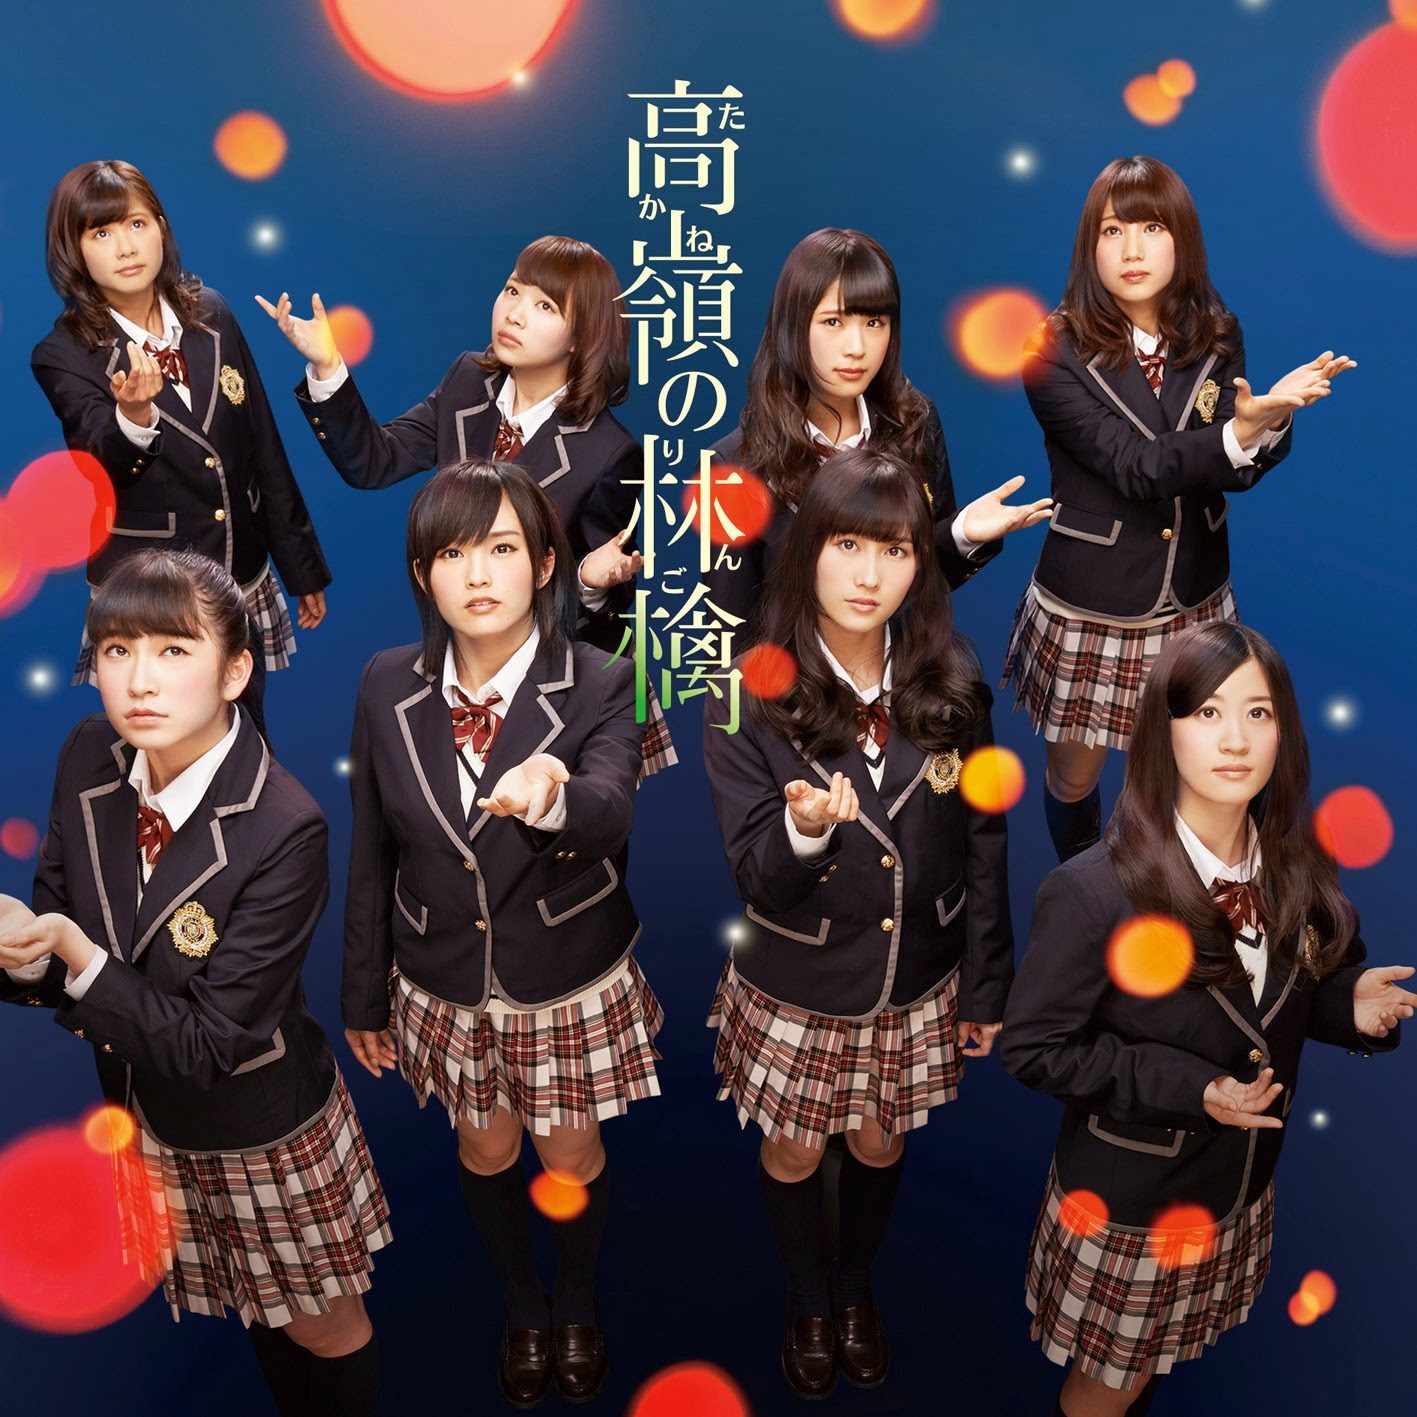 9th+-+高嶺の林檎(通常盤Type-A).jpg (1417×1417)